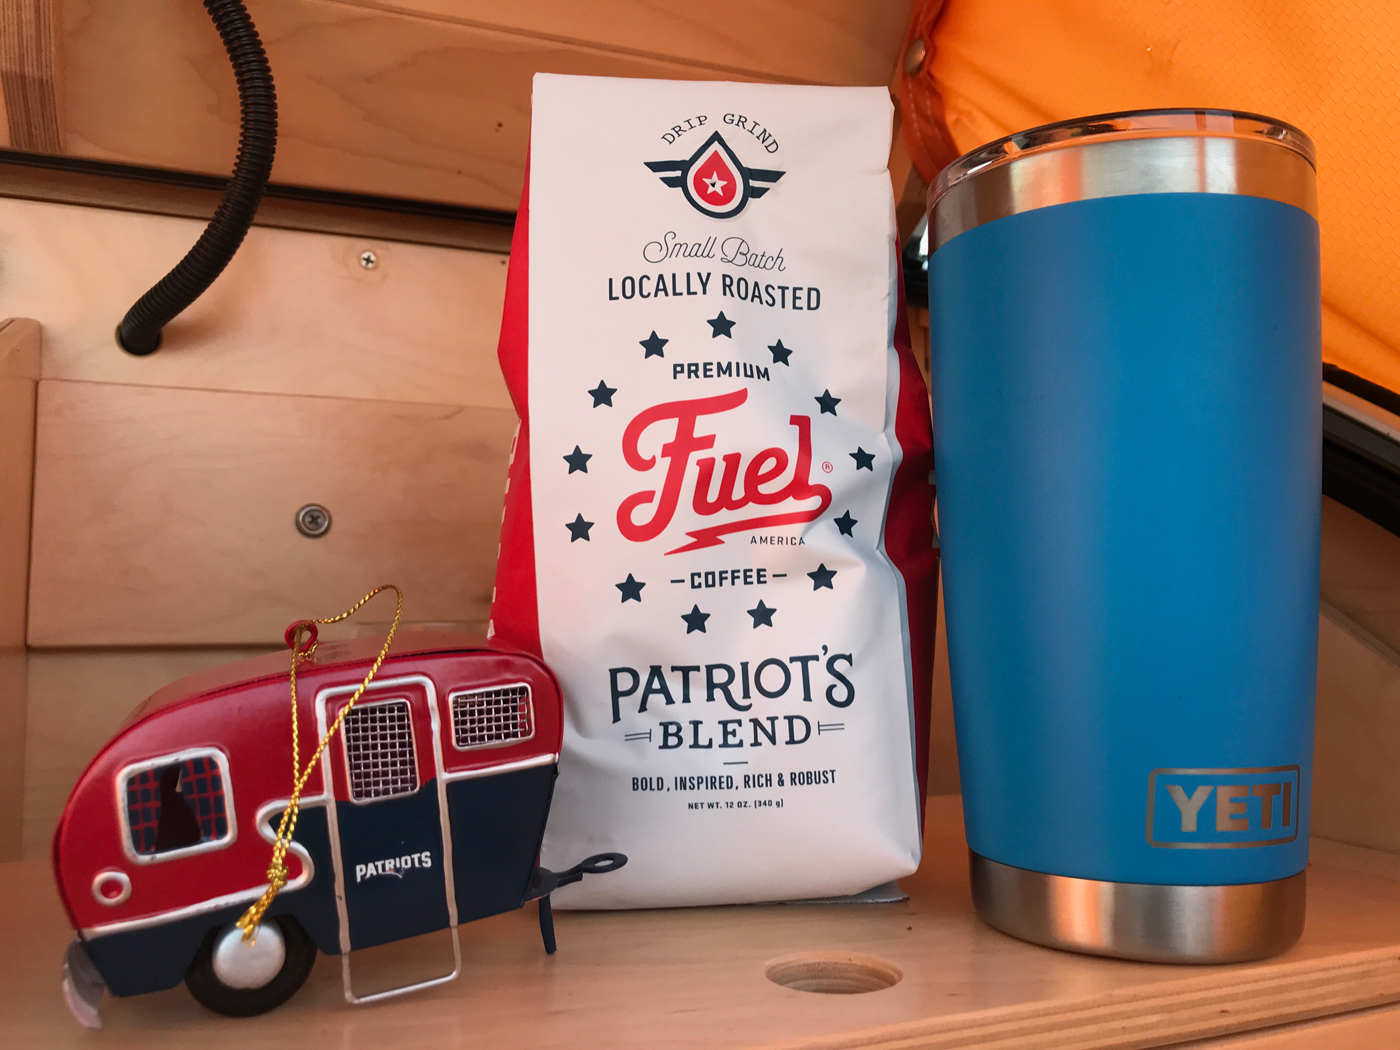 Yes, Patriots coffee